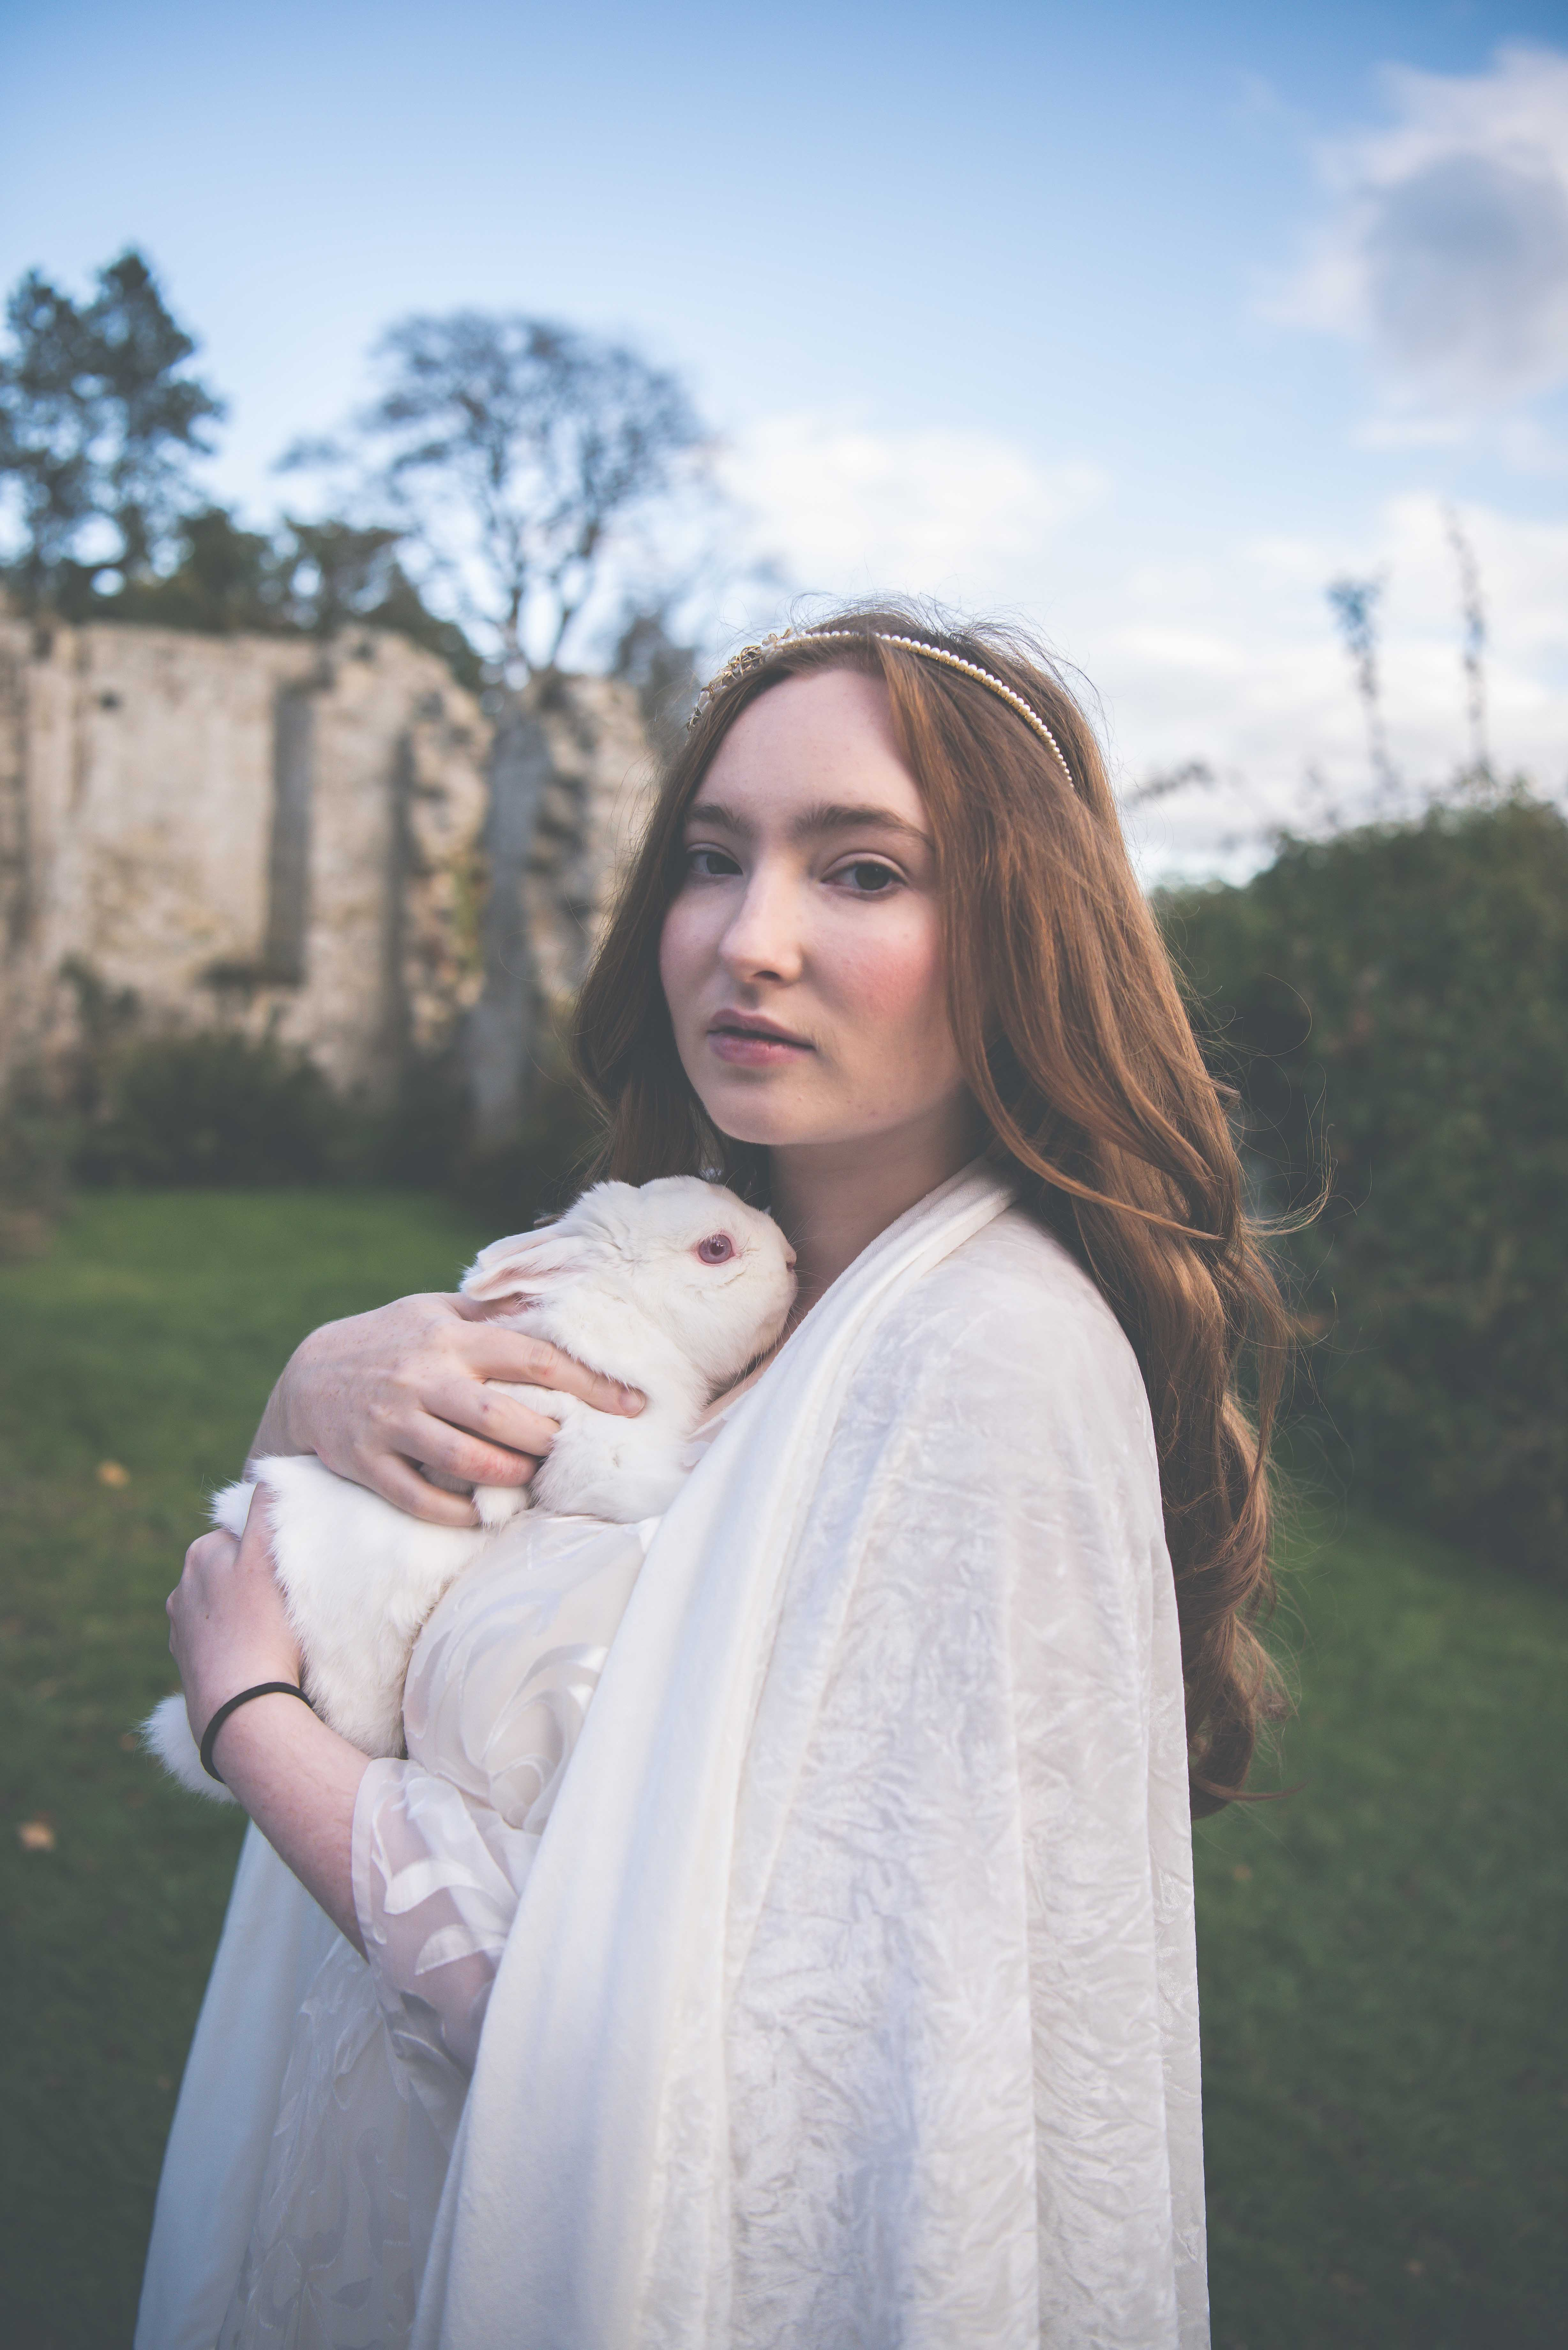 Live your own fairytale wedding - BexBrides - Jervaulx-0330